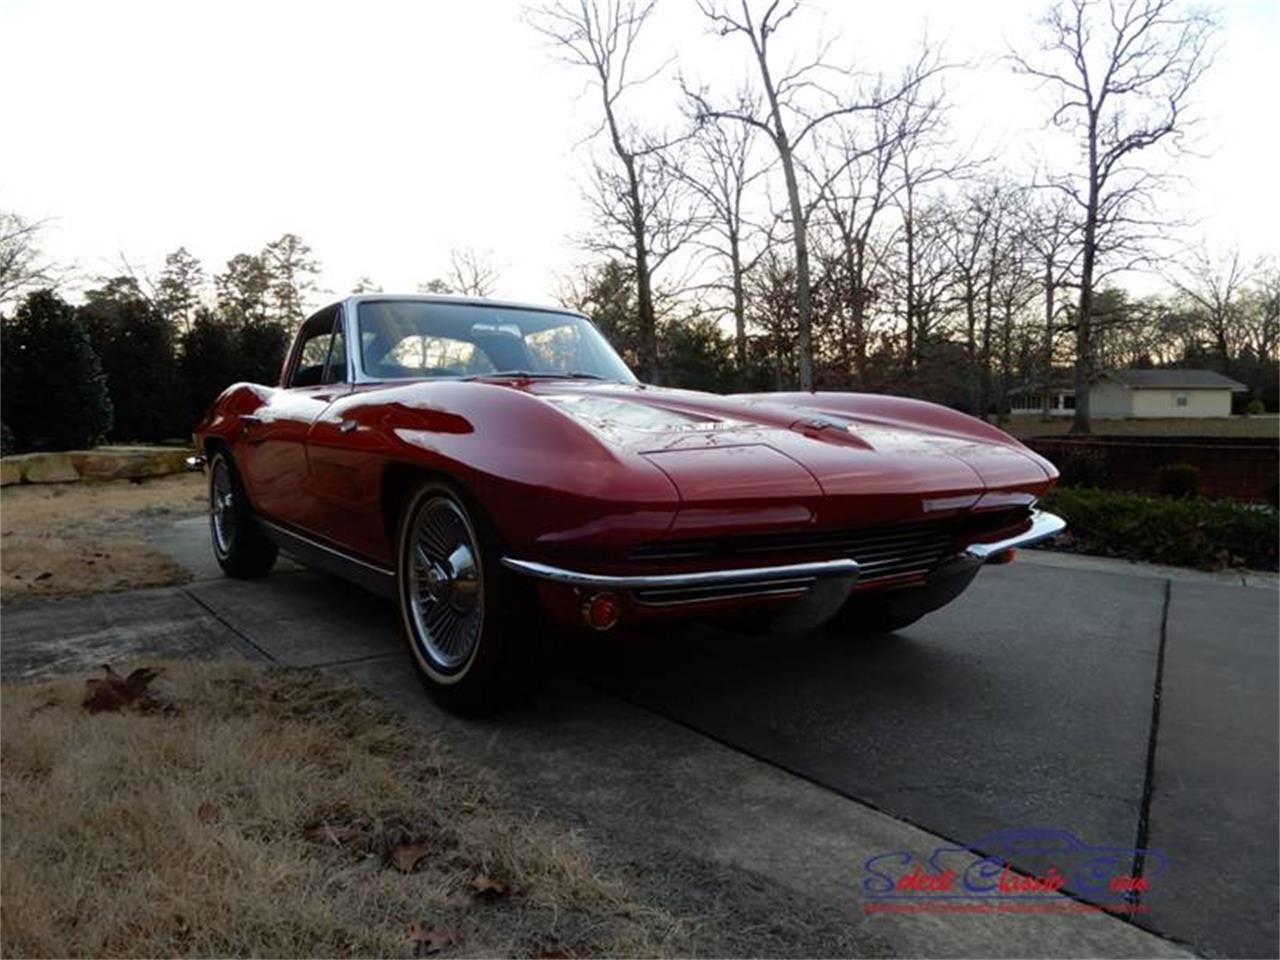 Large Picture of '63 Chevrolet Corvette - $89,500.00 - QE3V